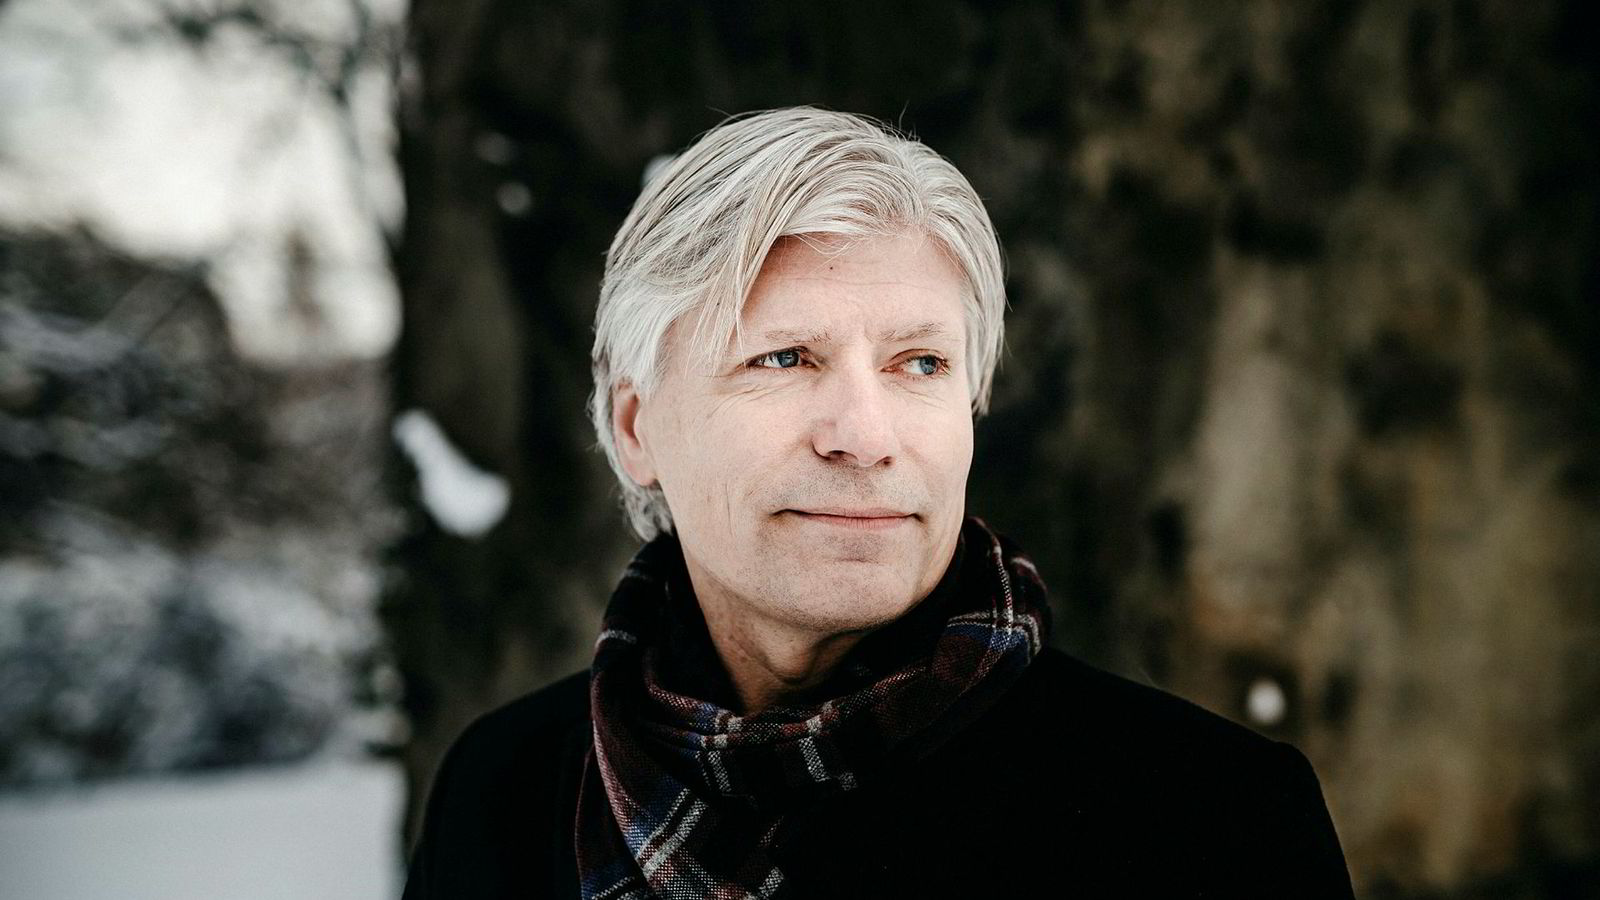 Ola Elvestuen, Norges klima- og miljøminister, mener Norges avfallshåndtering er et eksempel til etterfølgelse.